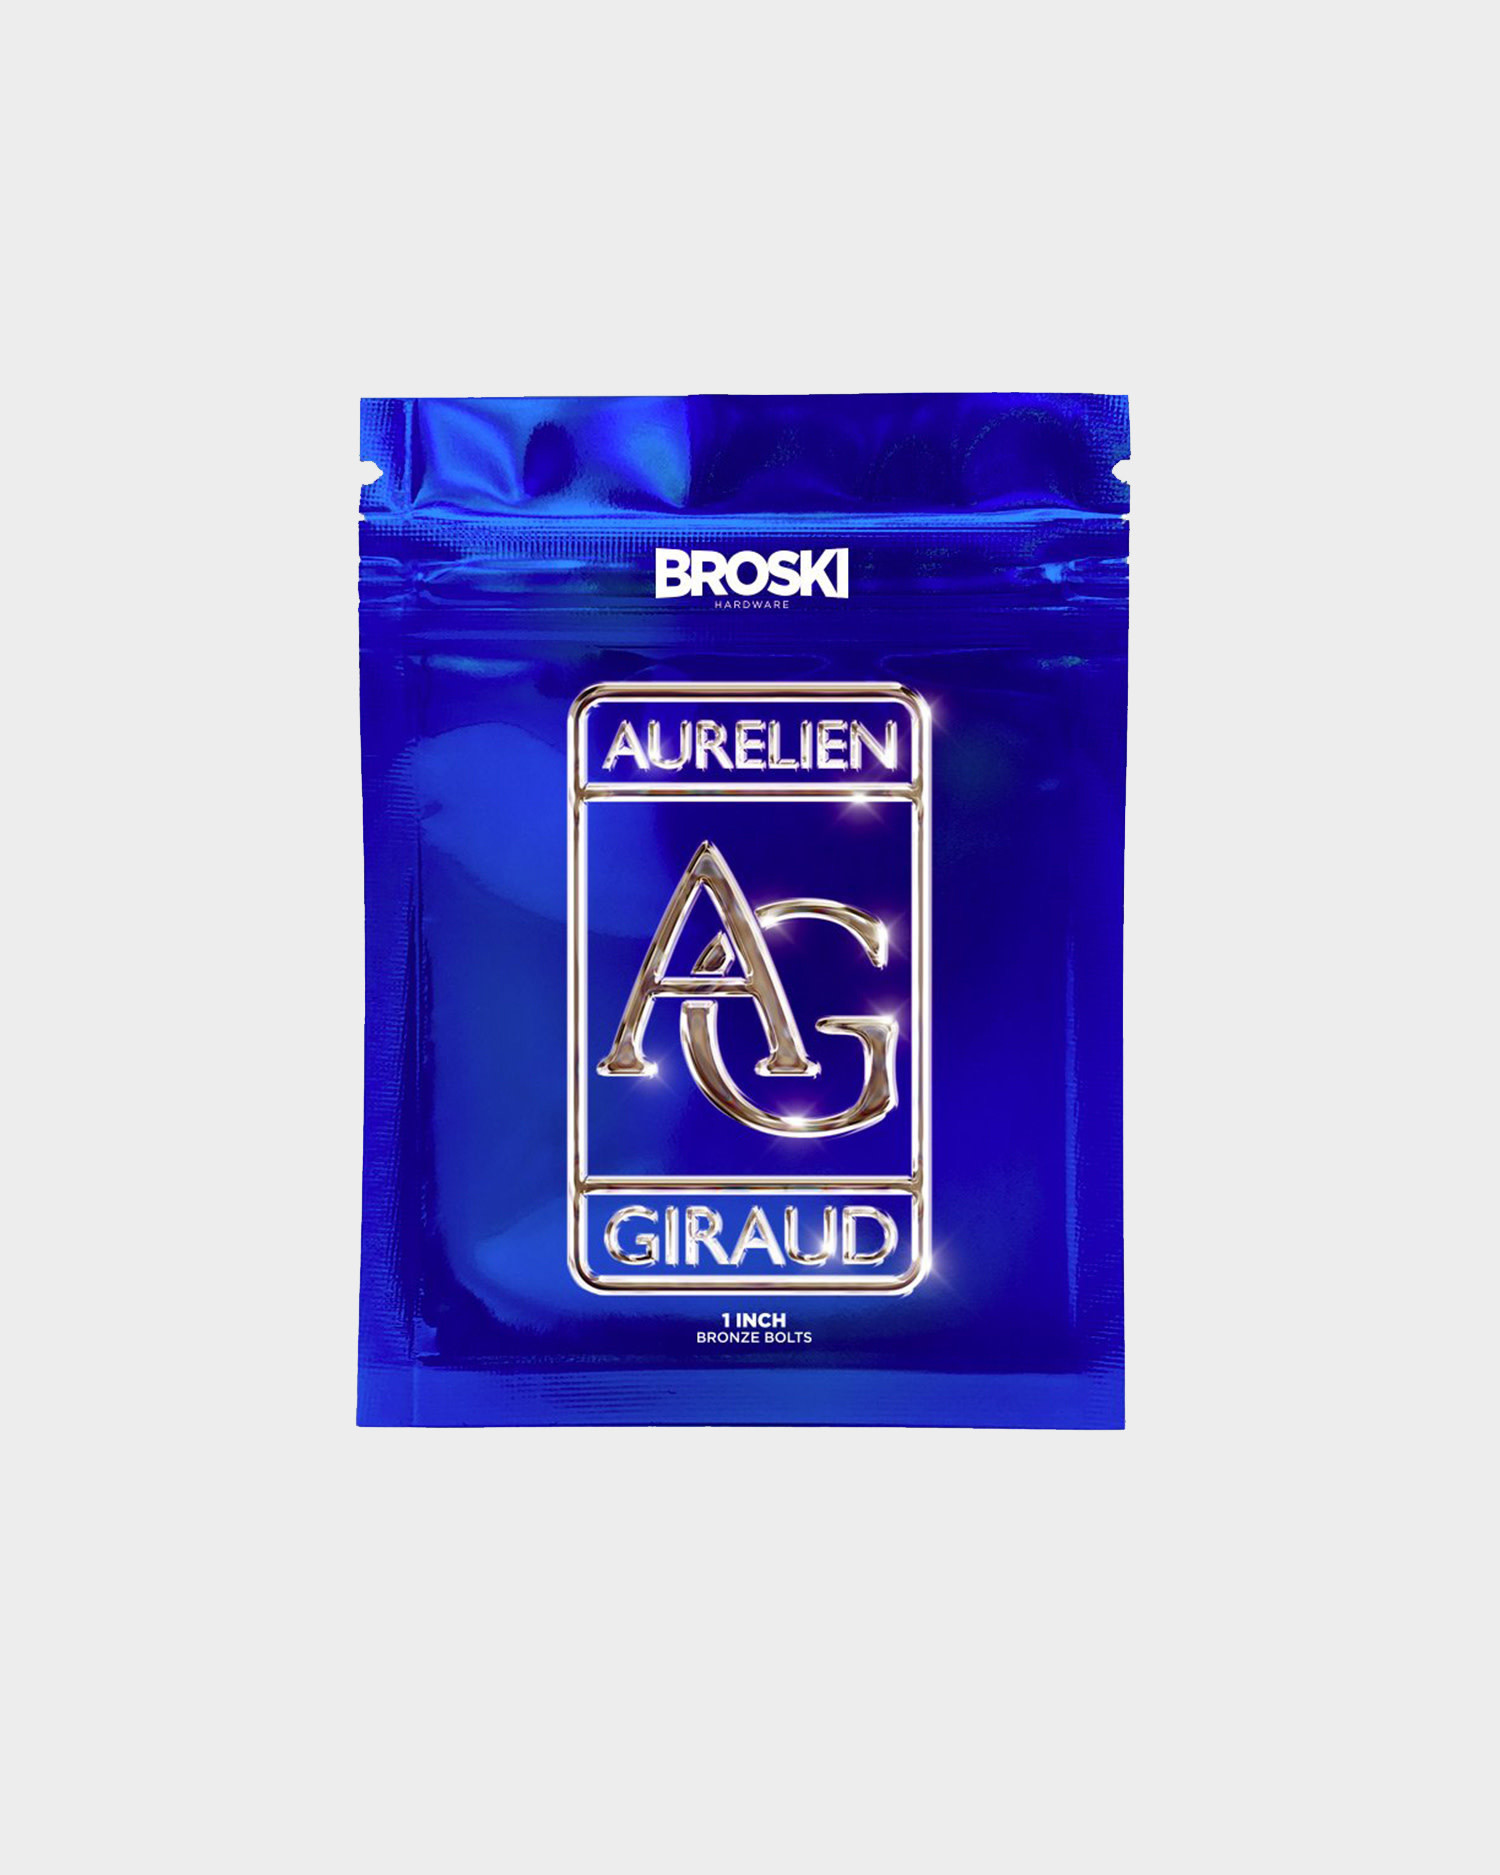 "Broski Hardware Aurelien Giraud 1"" Bronze"